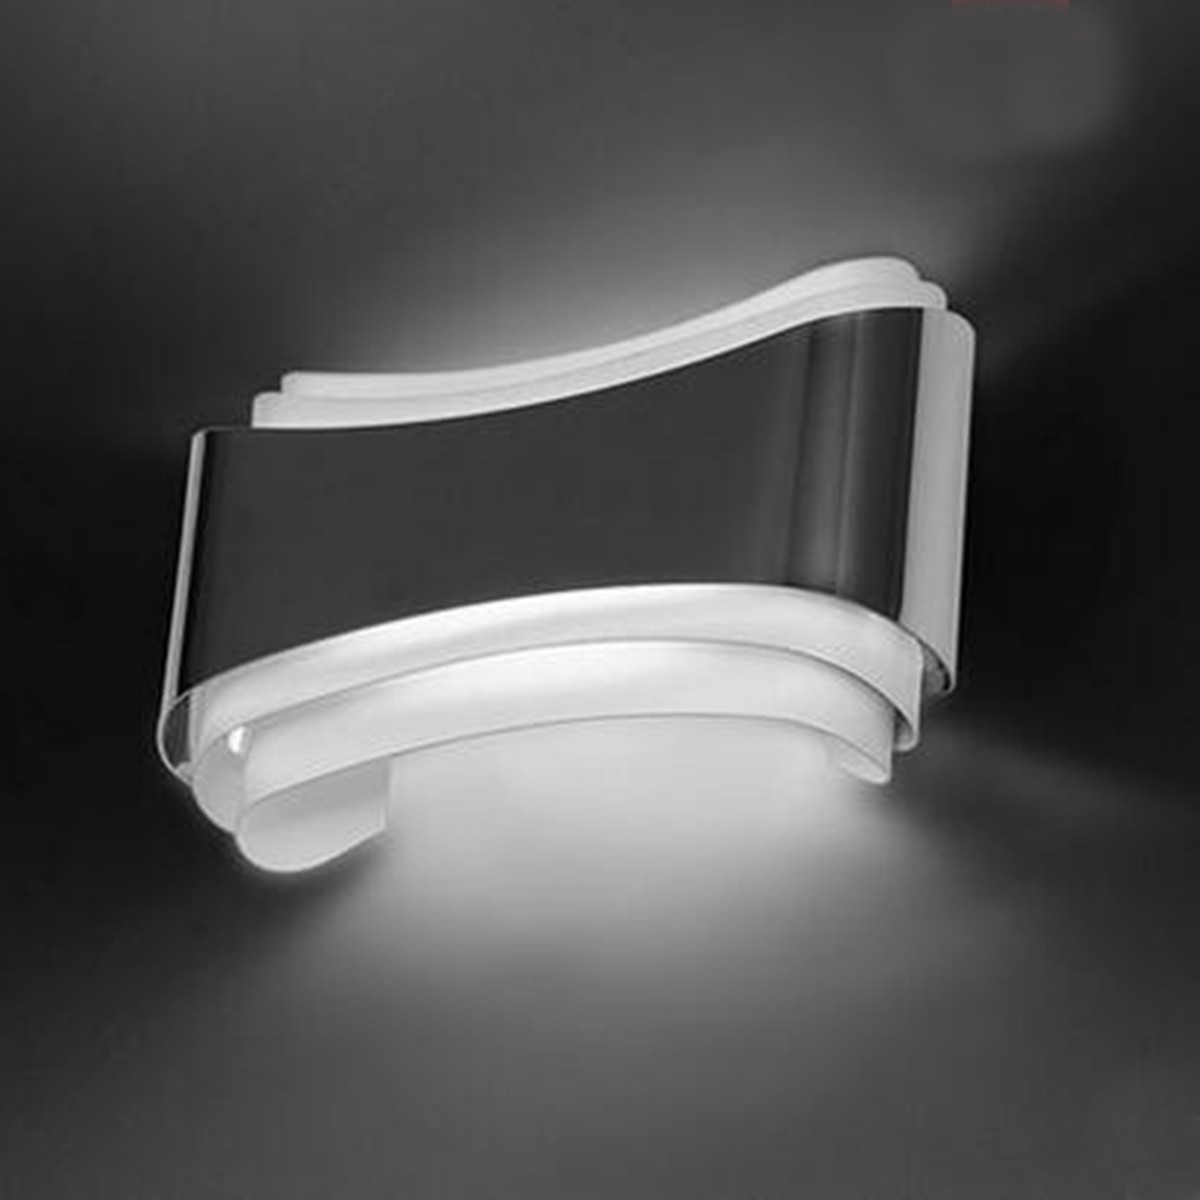 Industrielle Vintage Metall FÜhrte Wand Licht Eisen Energiesparende Wand Lampen Korridor Bett Nachttisch Bad Nacht Led-leuchten Wohnkultur 220 V Wandleuchten Licht & Beleuchtung